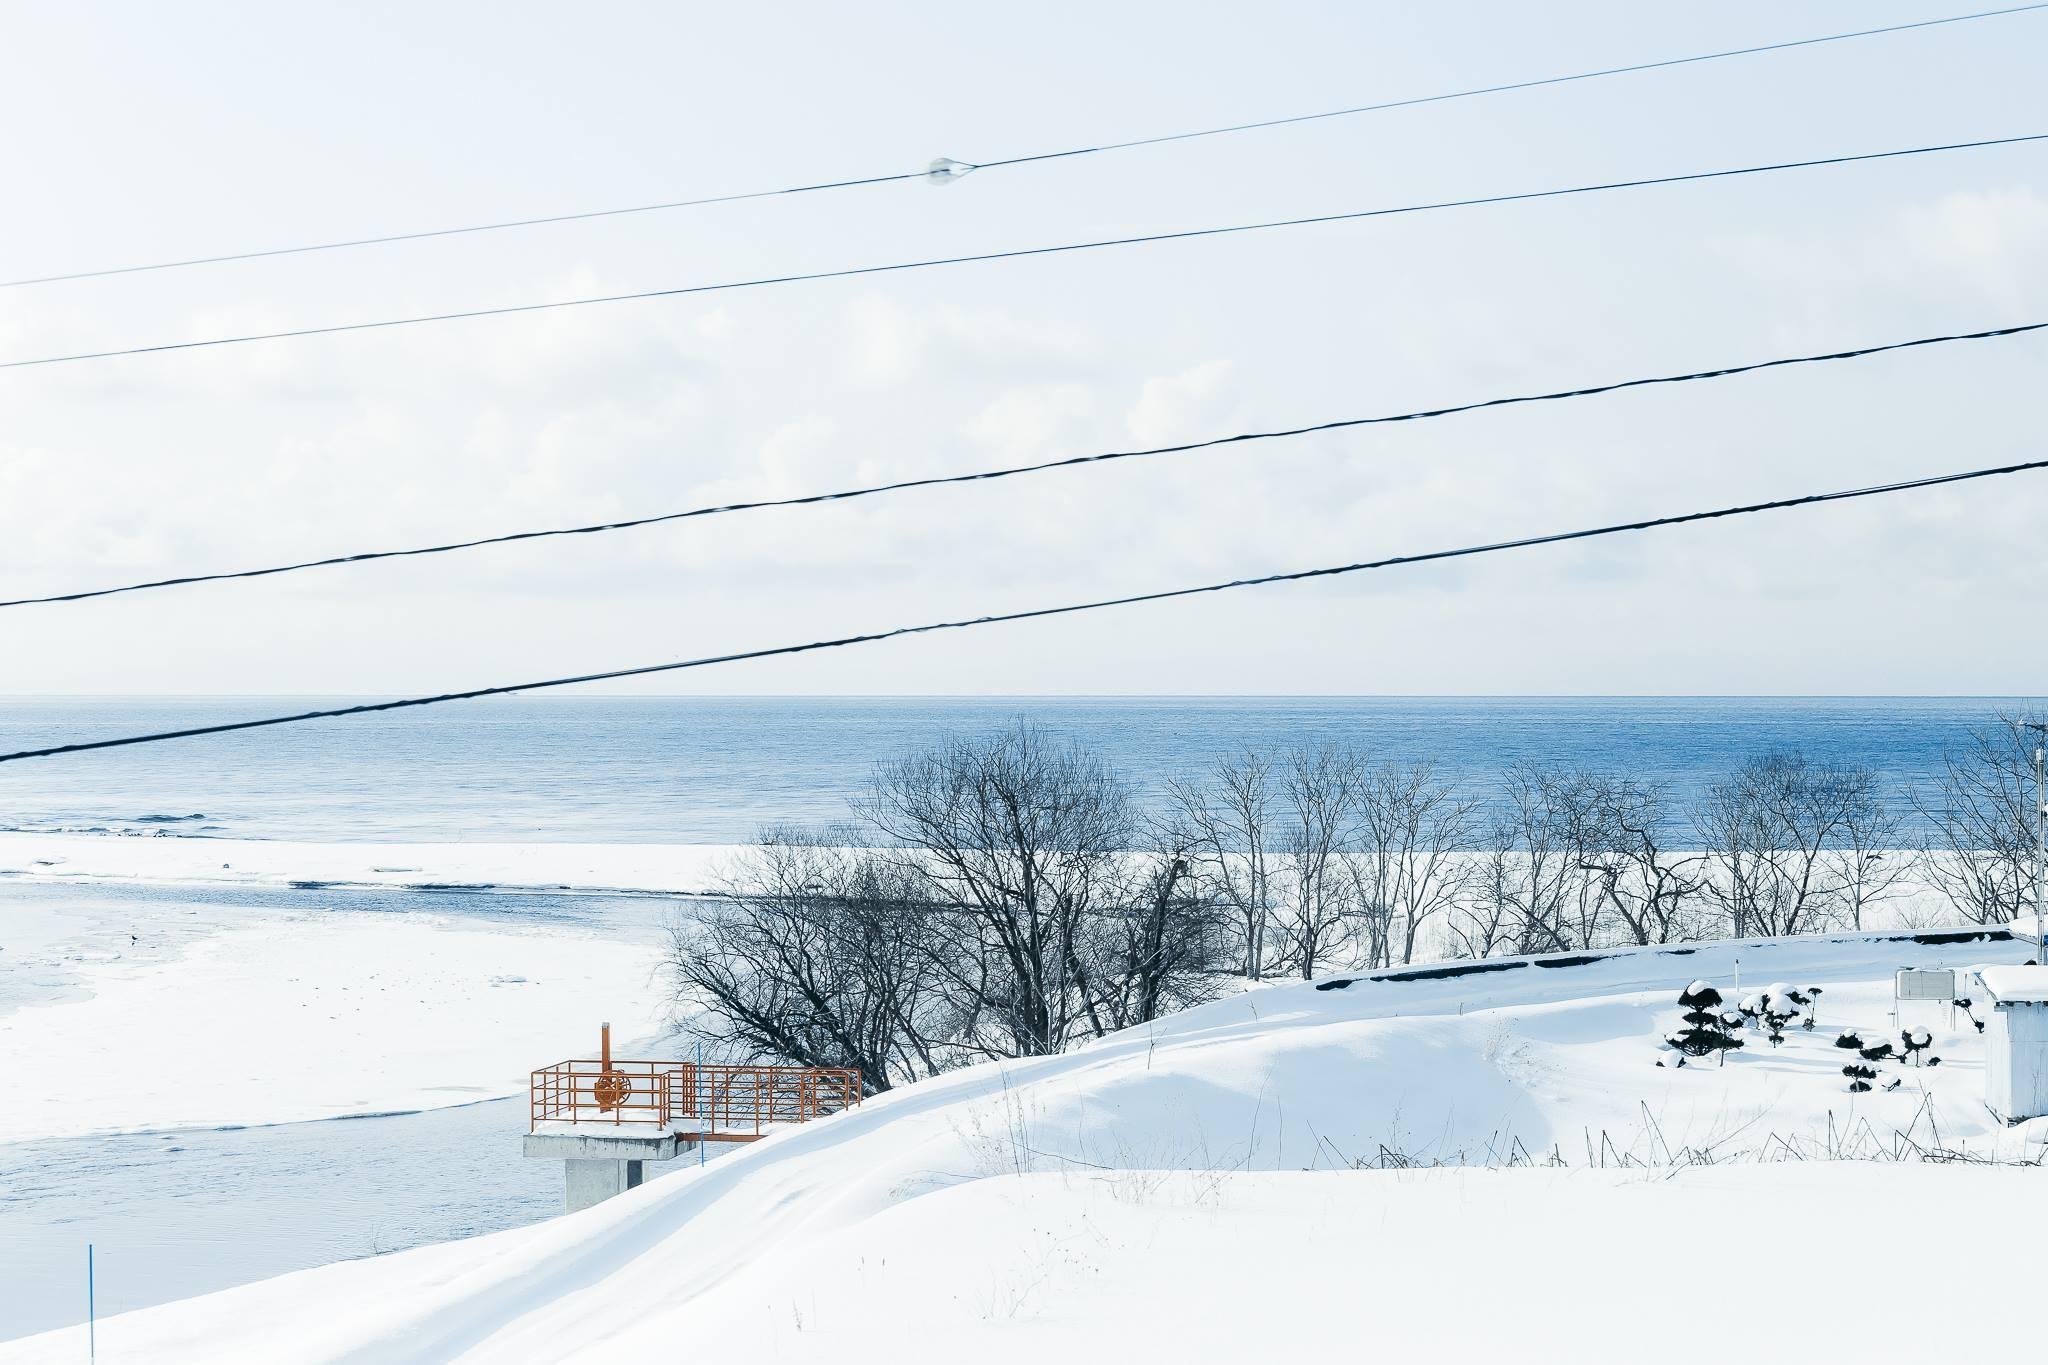 Hokkaido tuyet trang, noi dang den nhat mua dong o Nhat Ban hinh anh 14